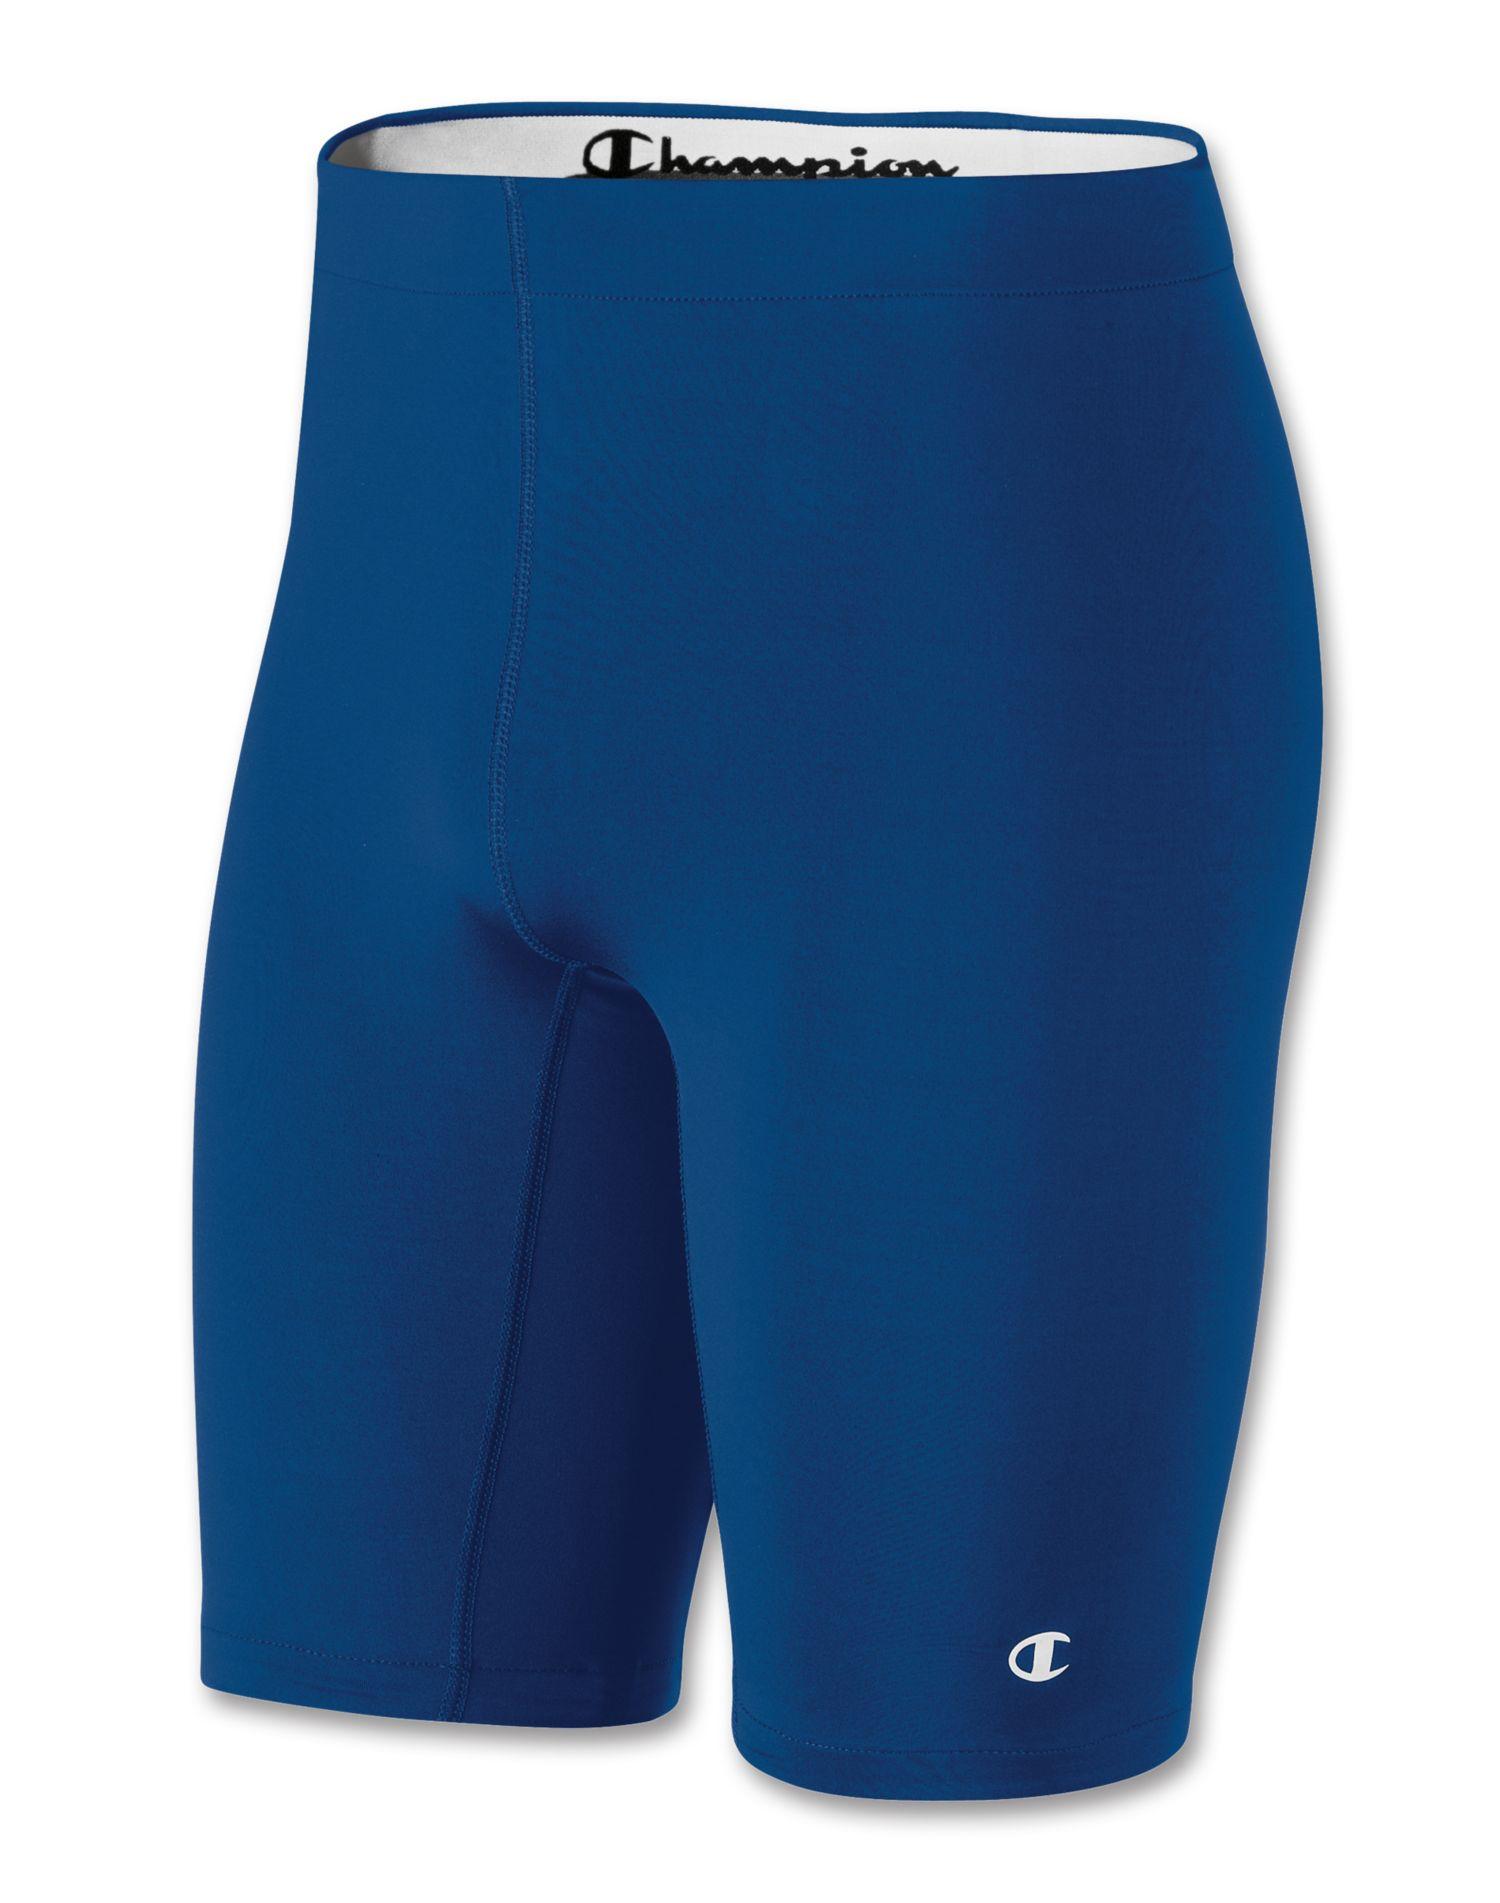 9 men's shorts